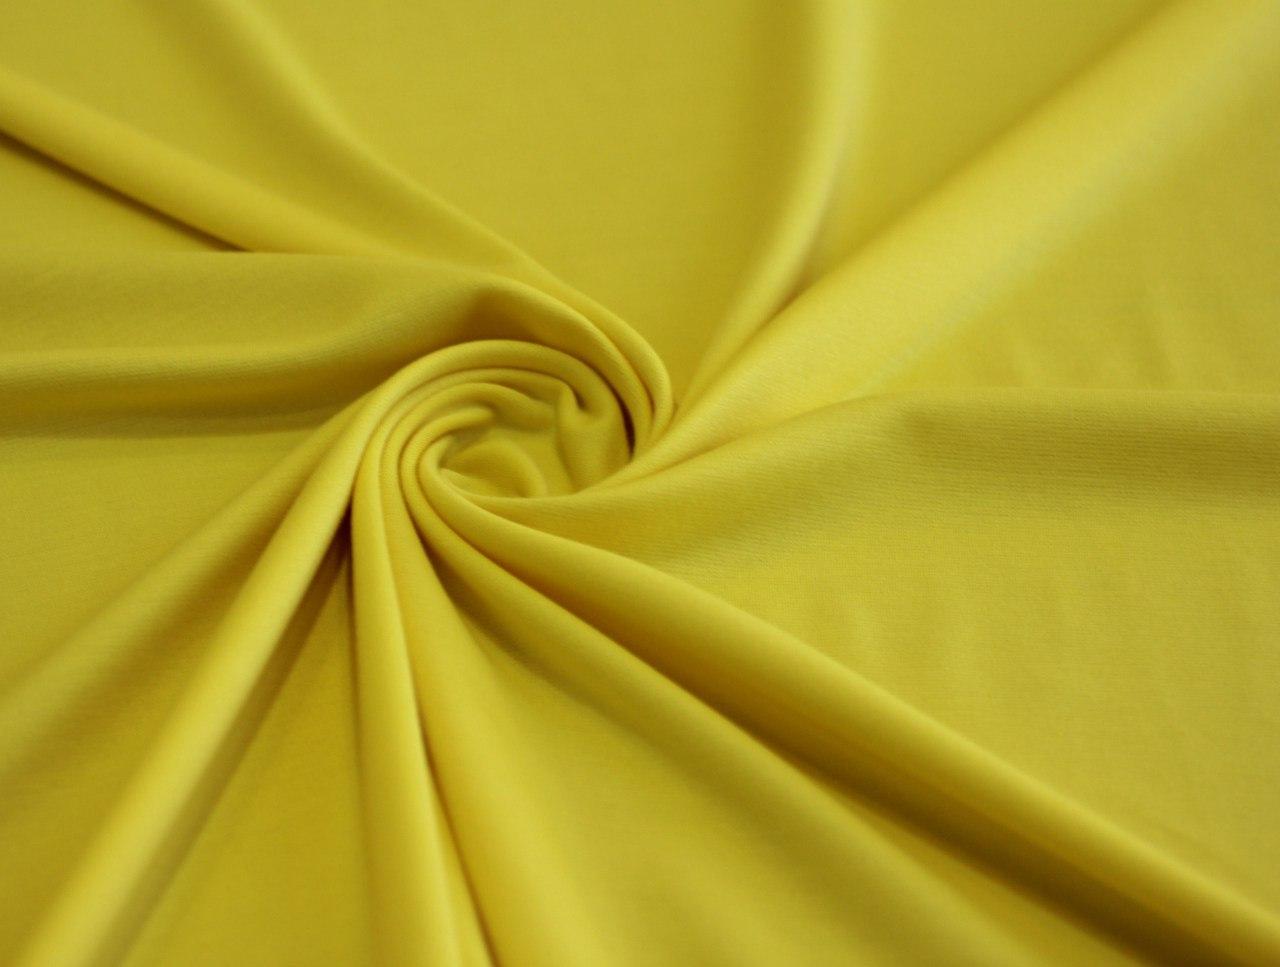 Ткань джерси цвет жёлтый